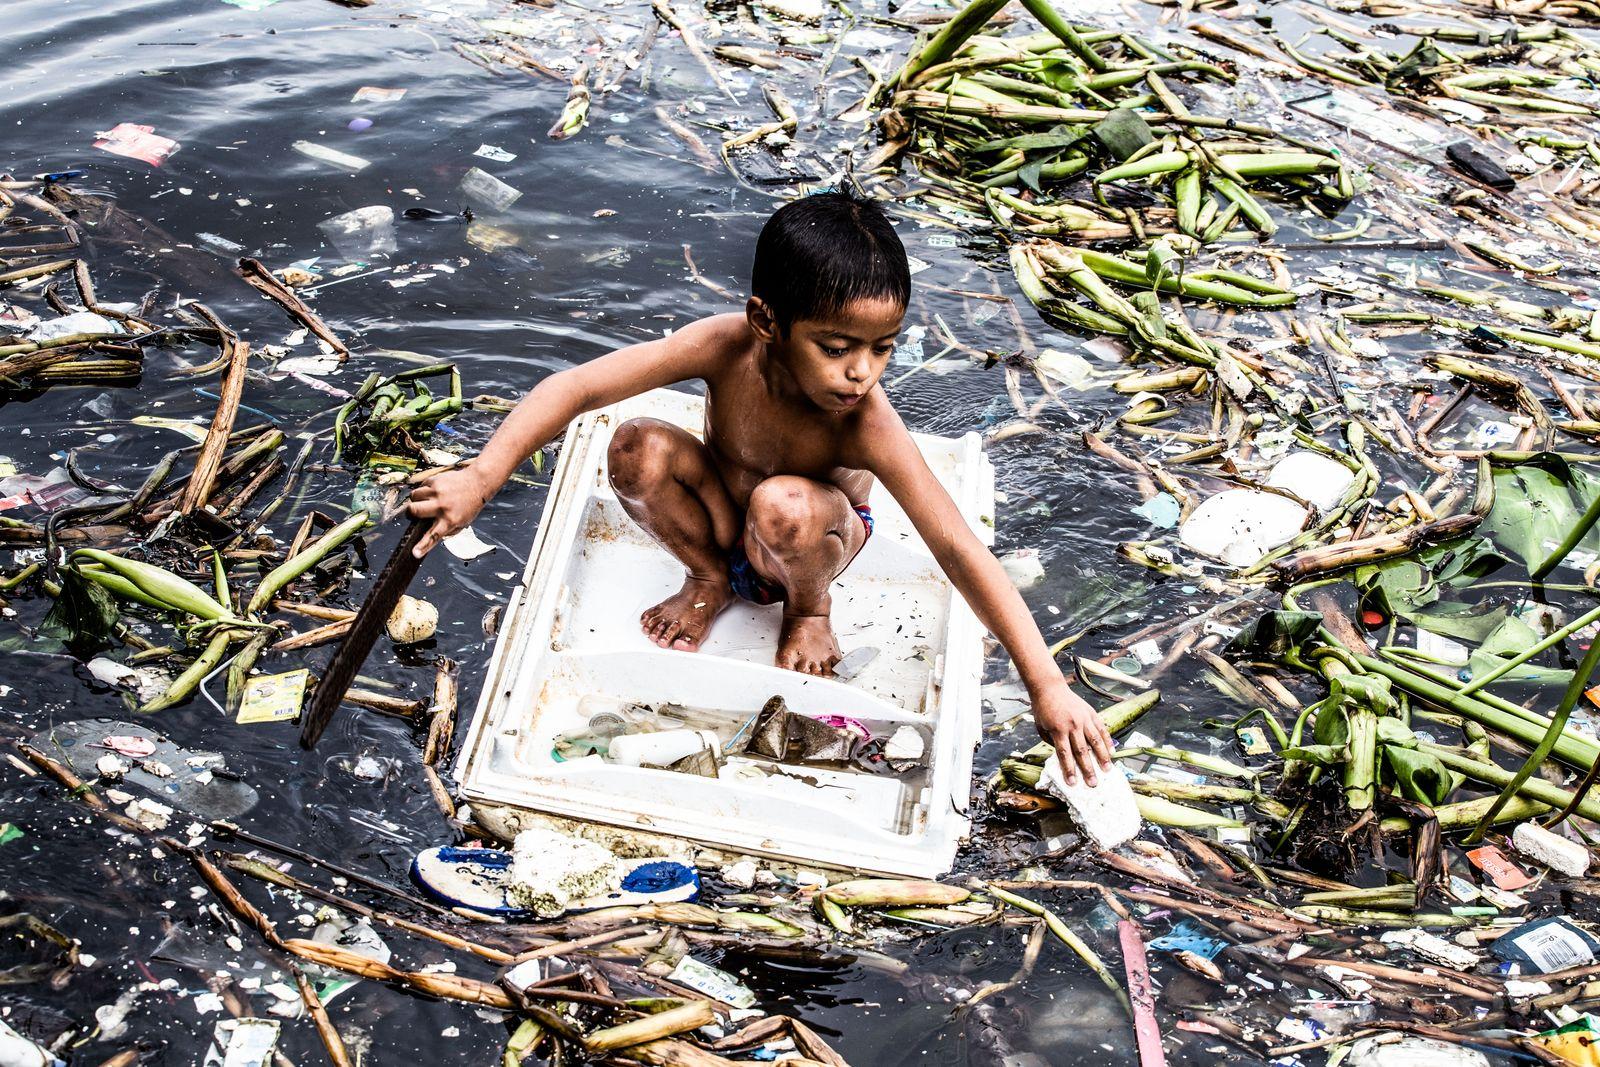 Reportage Im Meer aus Müll